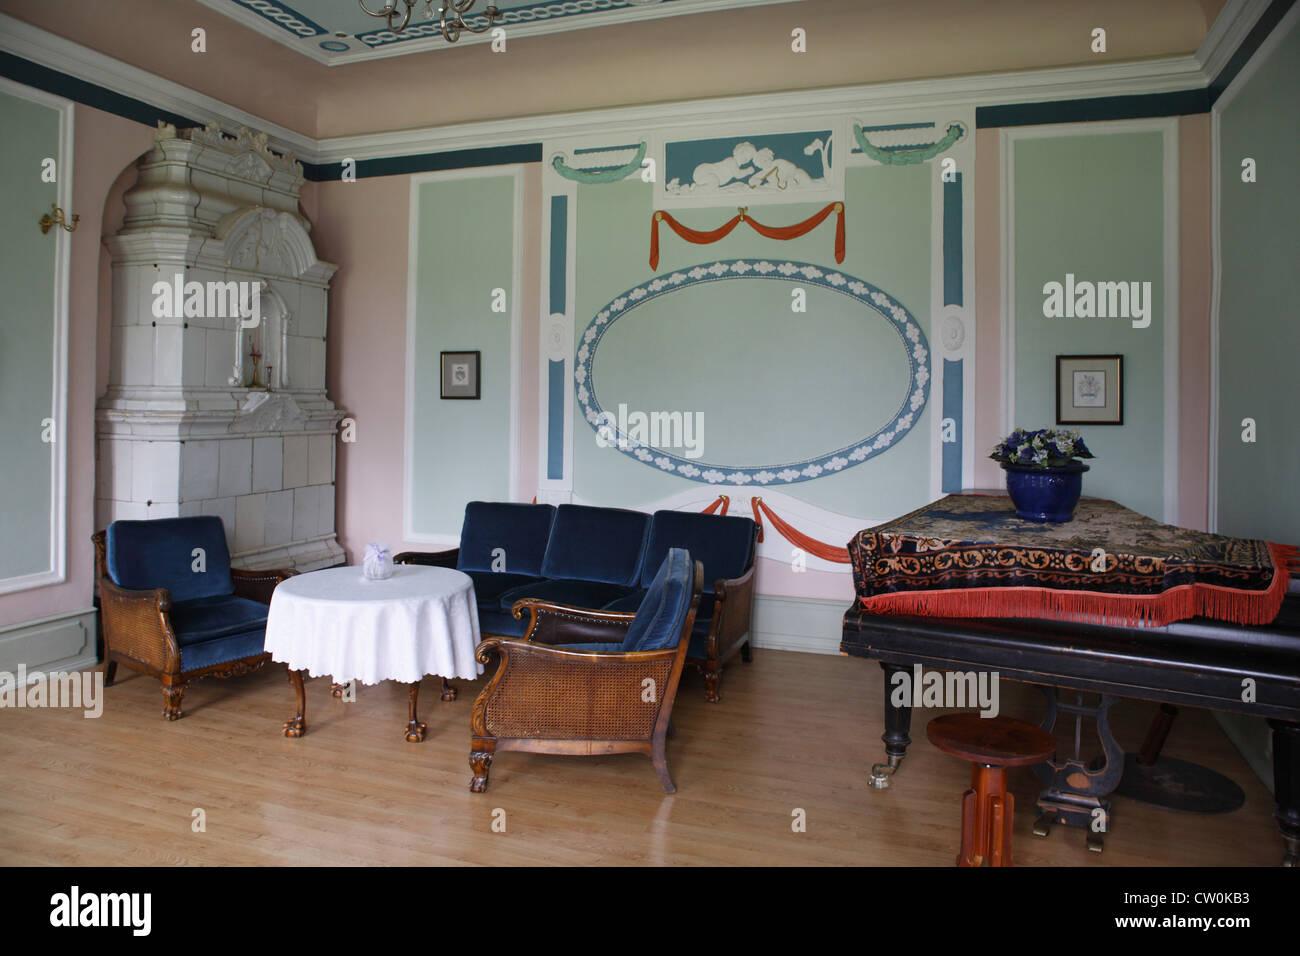 Estonia Tallinn, Sauer manor, drawing room - Stock Image